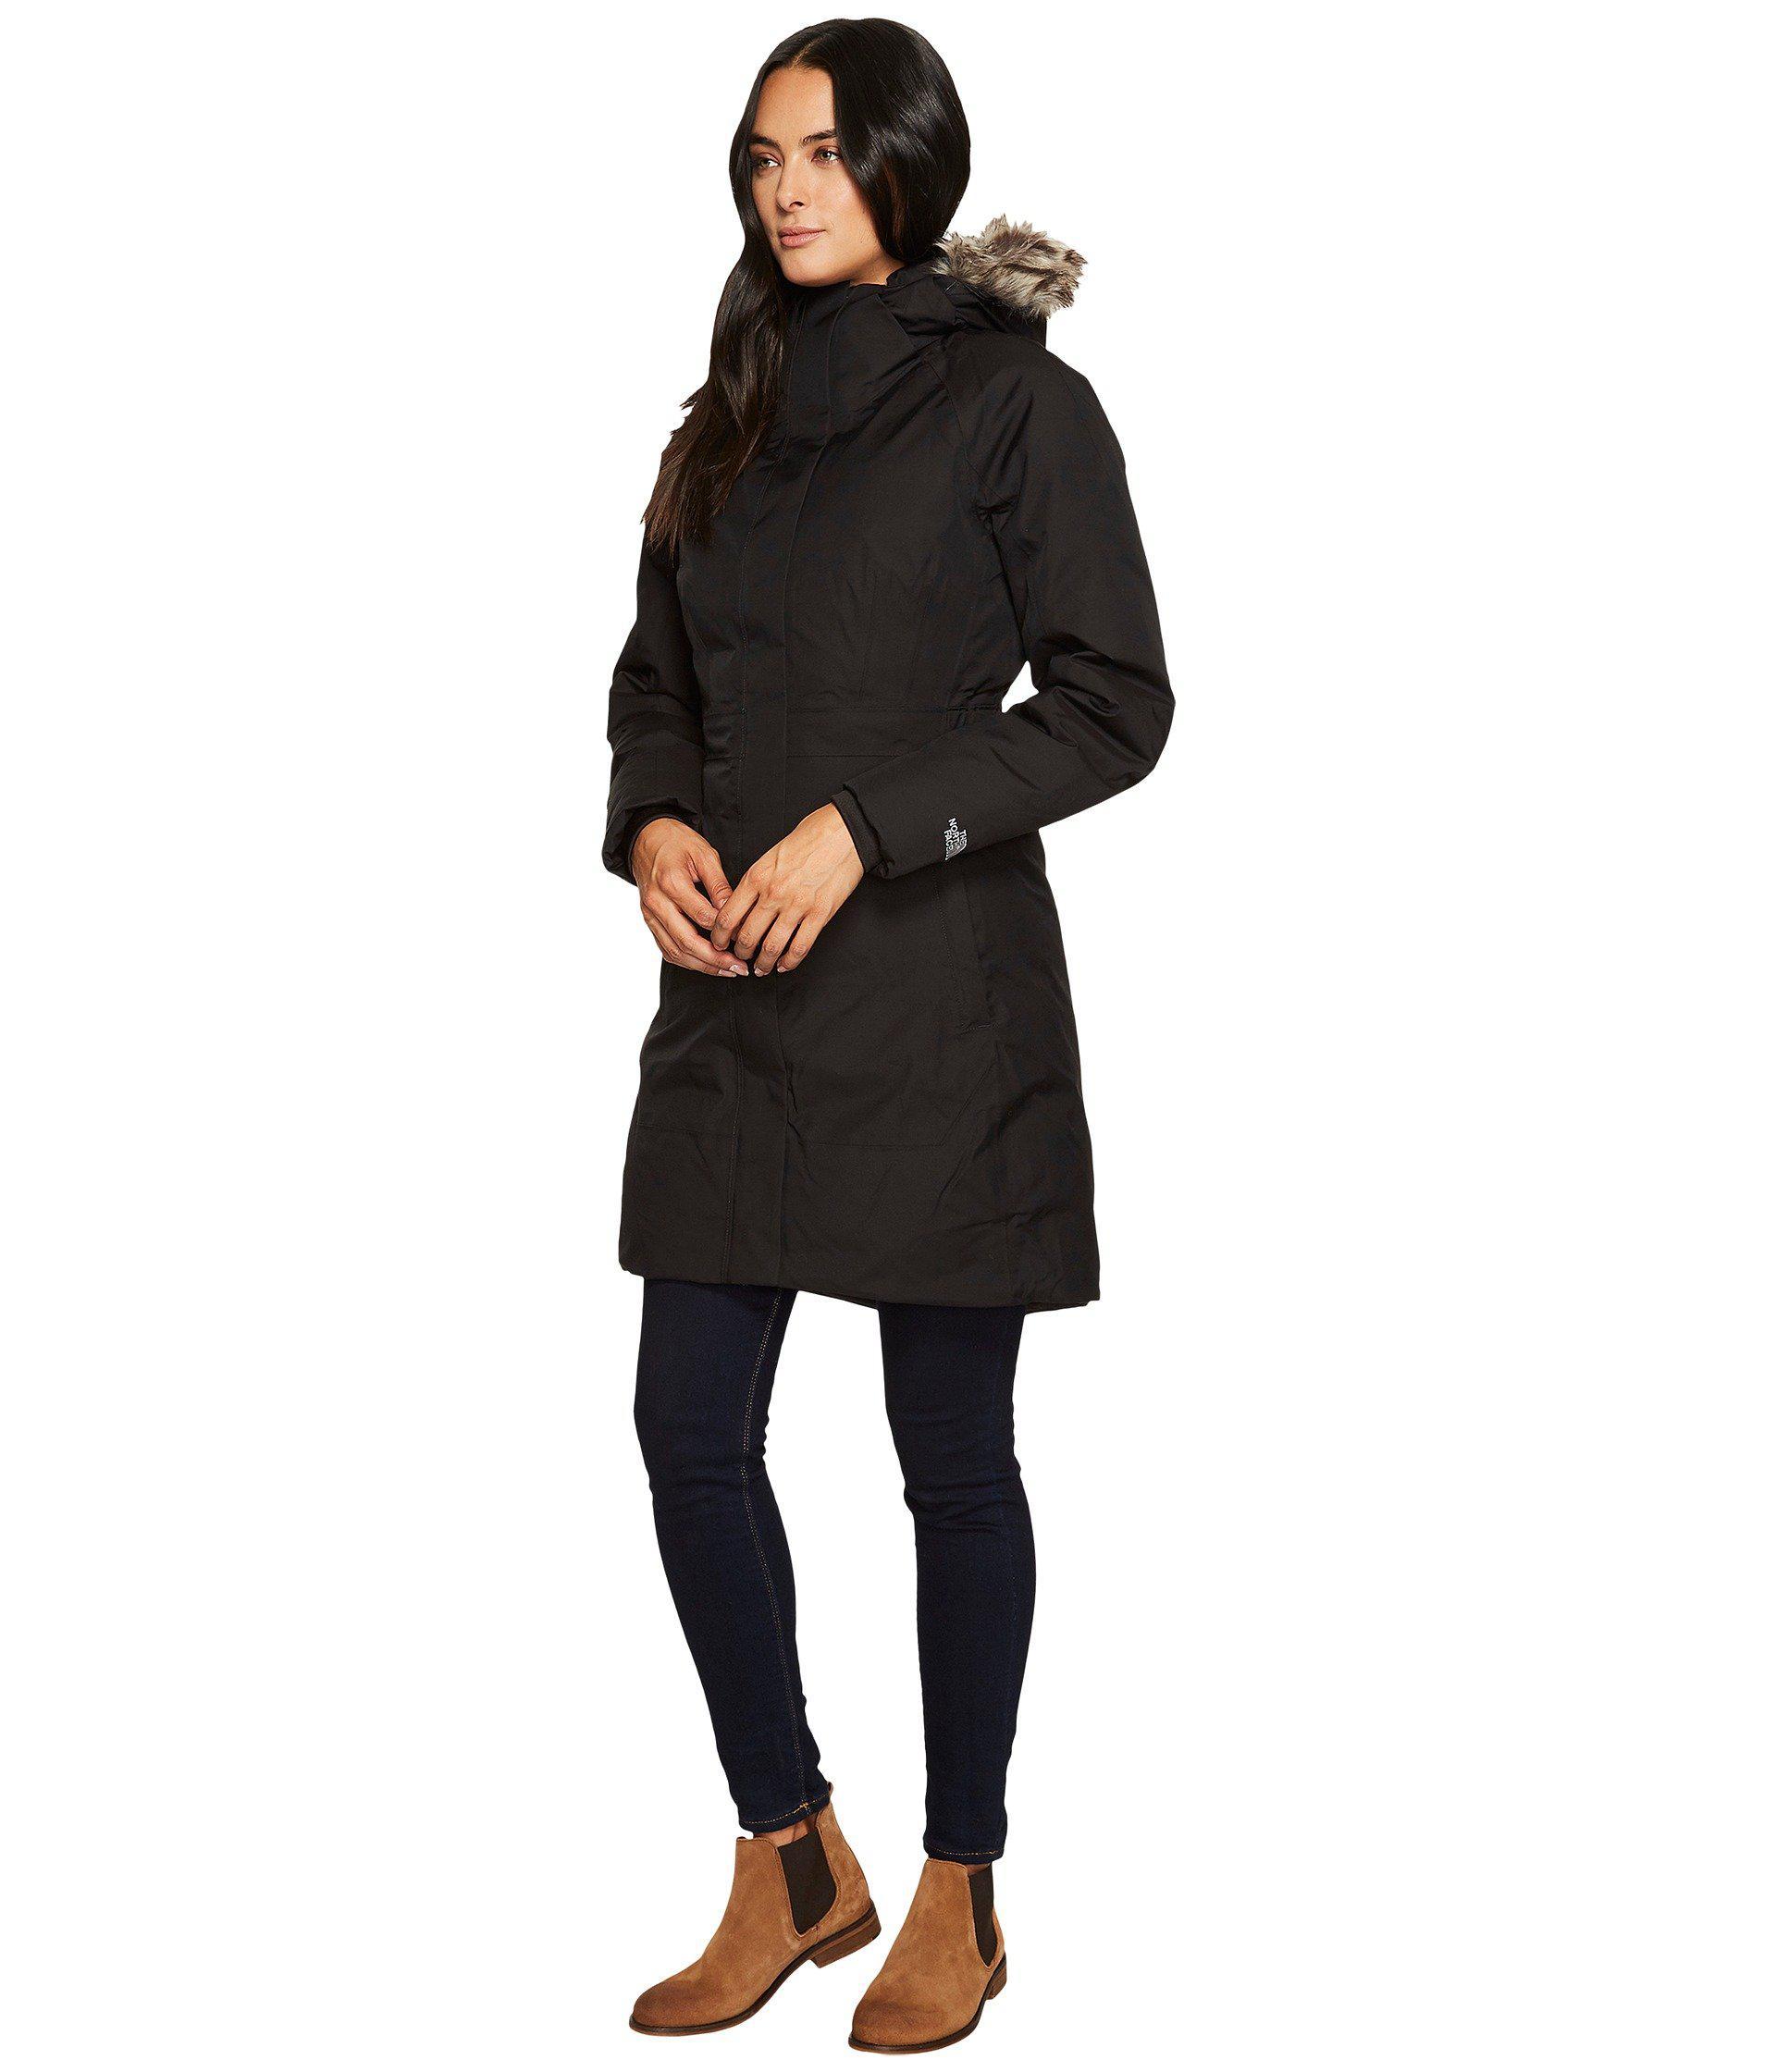 cec63950 The North Face Arctic Parka Ii (tnf Black) Women's Coat in Black - Lyst